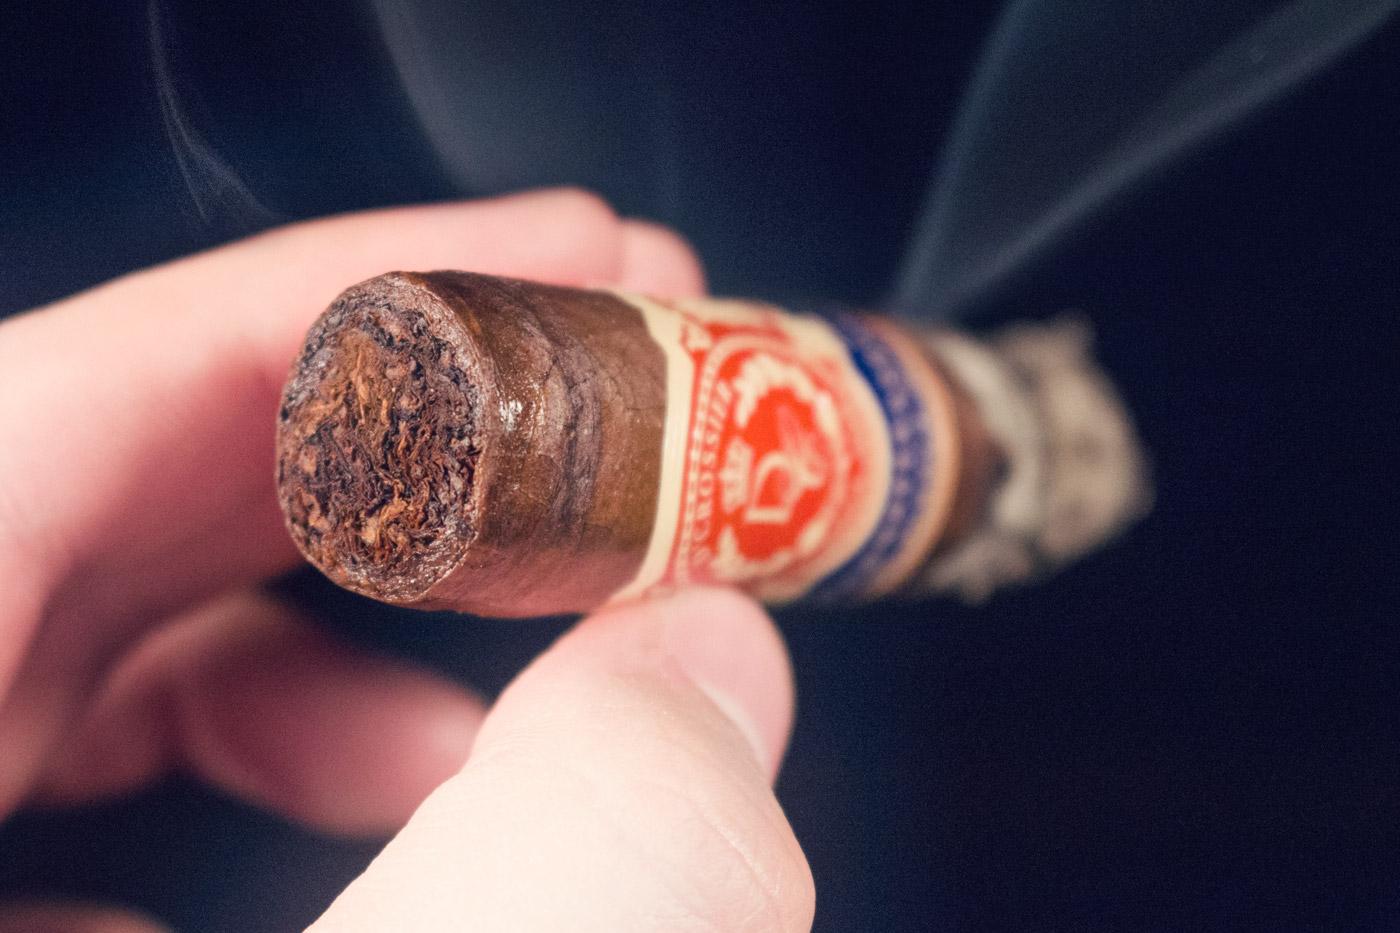 D'Crossier Pennsylvania Avenue Tainos cigar review